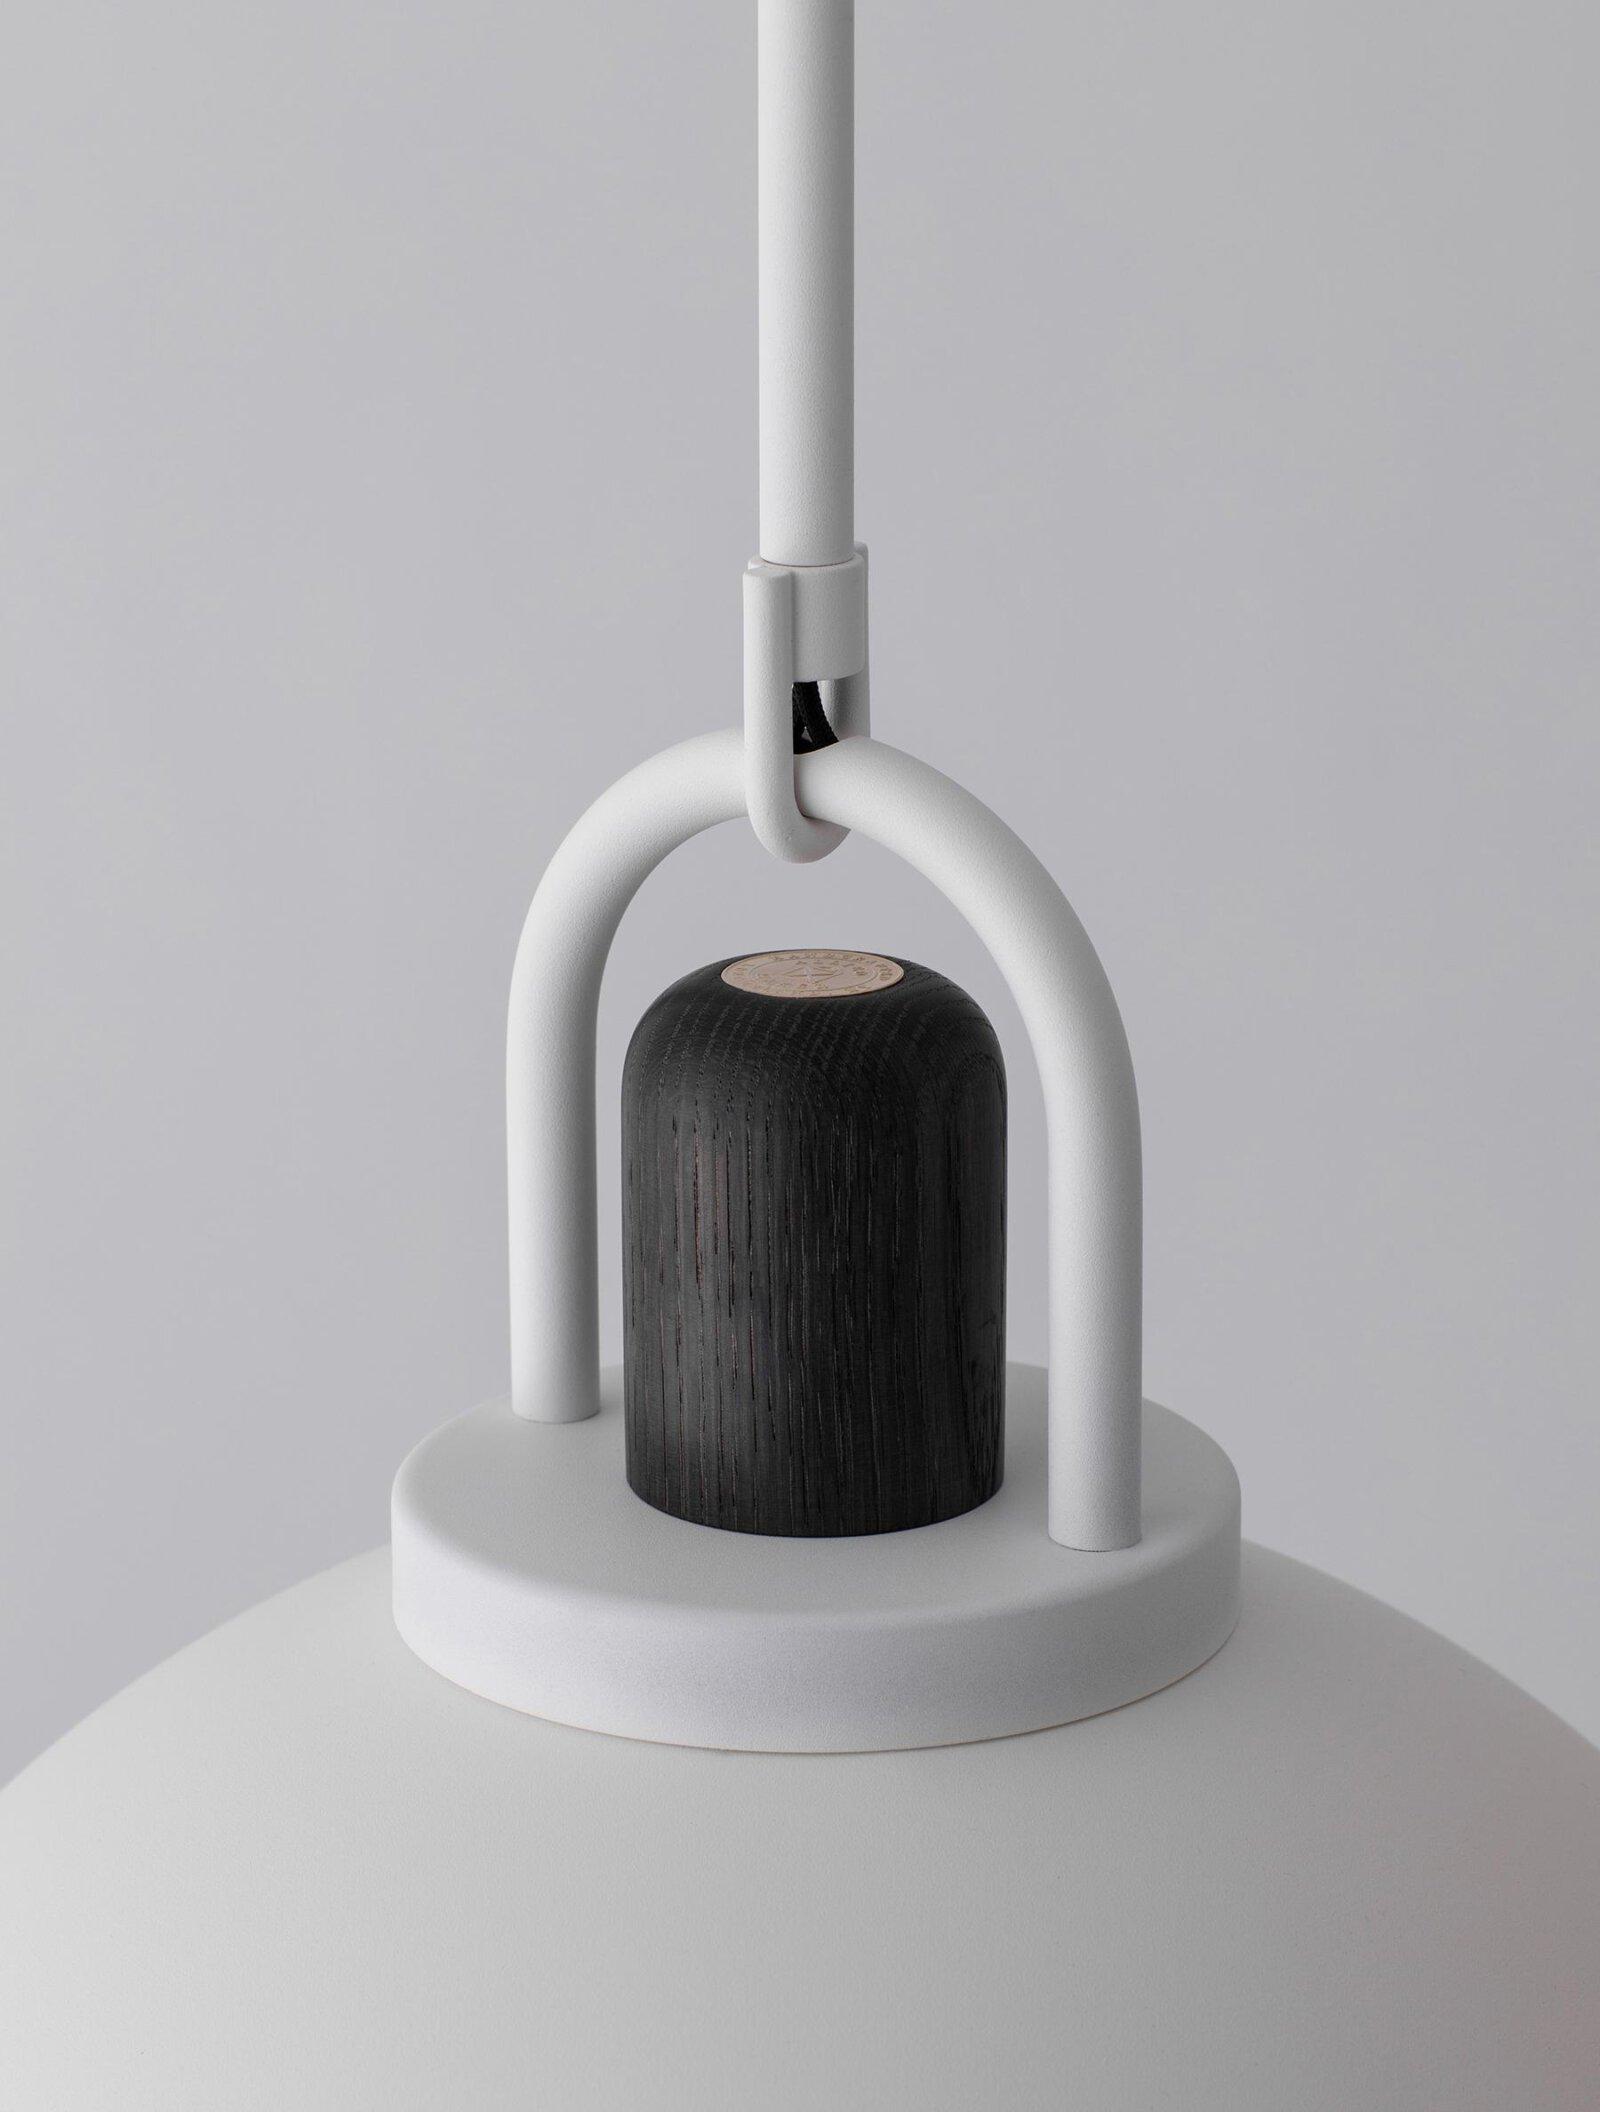 TinnappelMetz-allied-maker-arc-dome-pendant-07